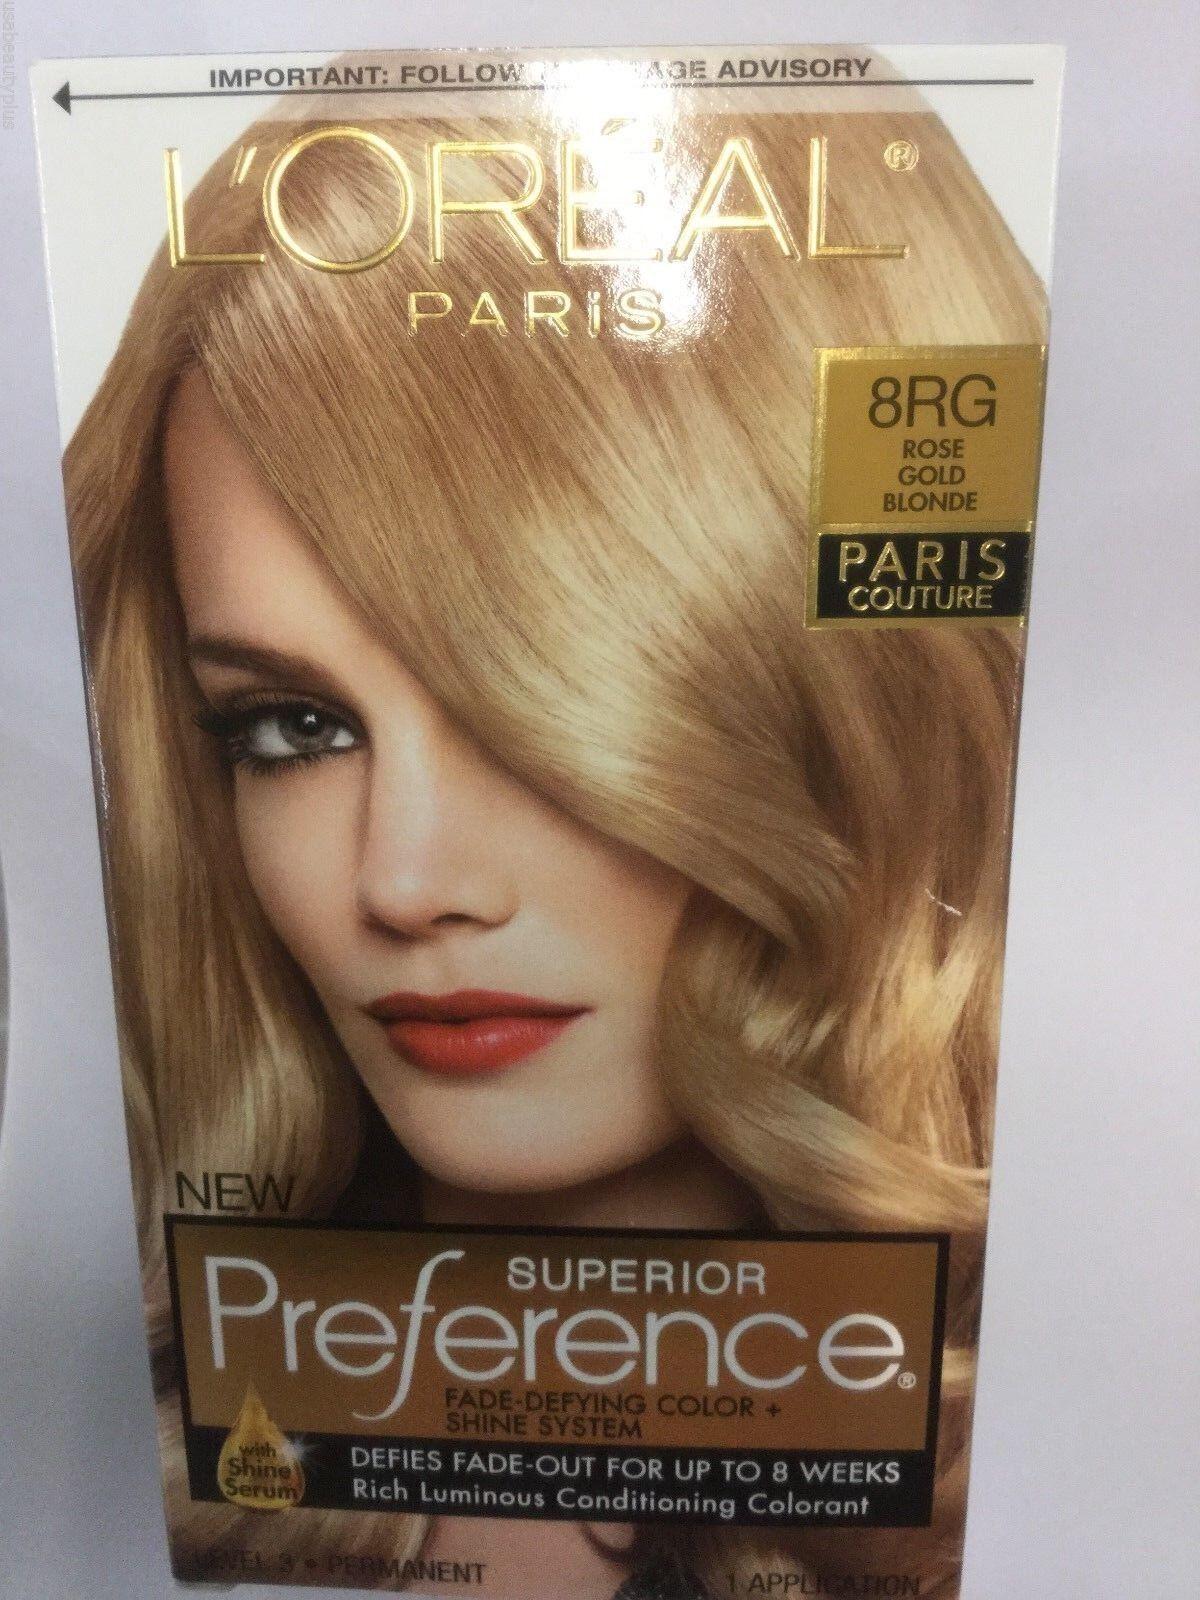 L Oreal Paris Preference Santa Monica 9 23 Light Rose Gold For Sale Online Ebay